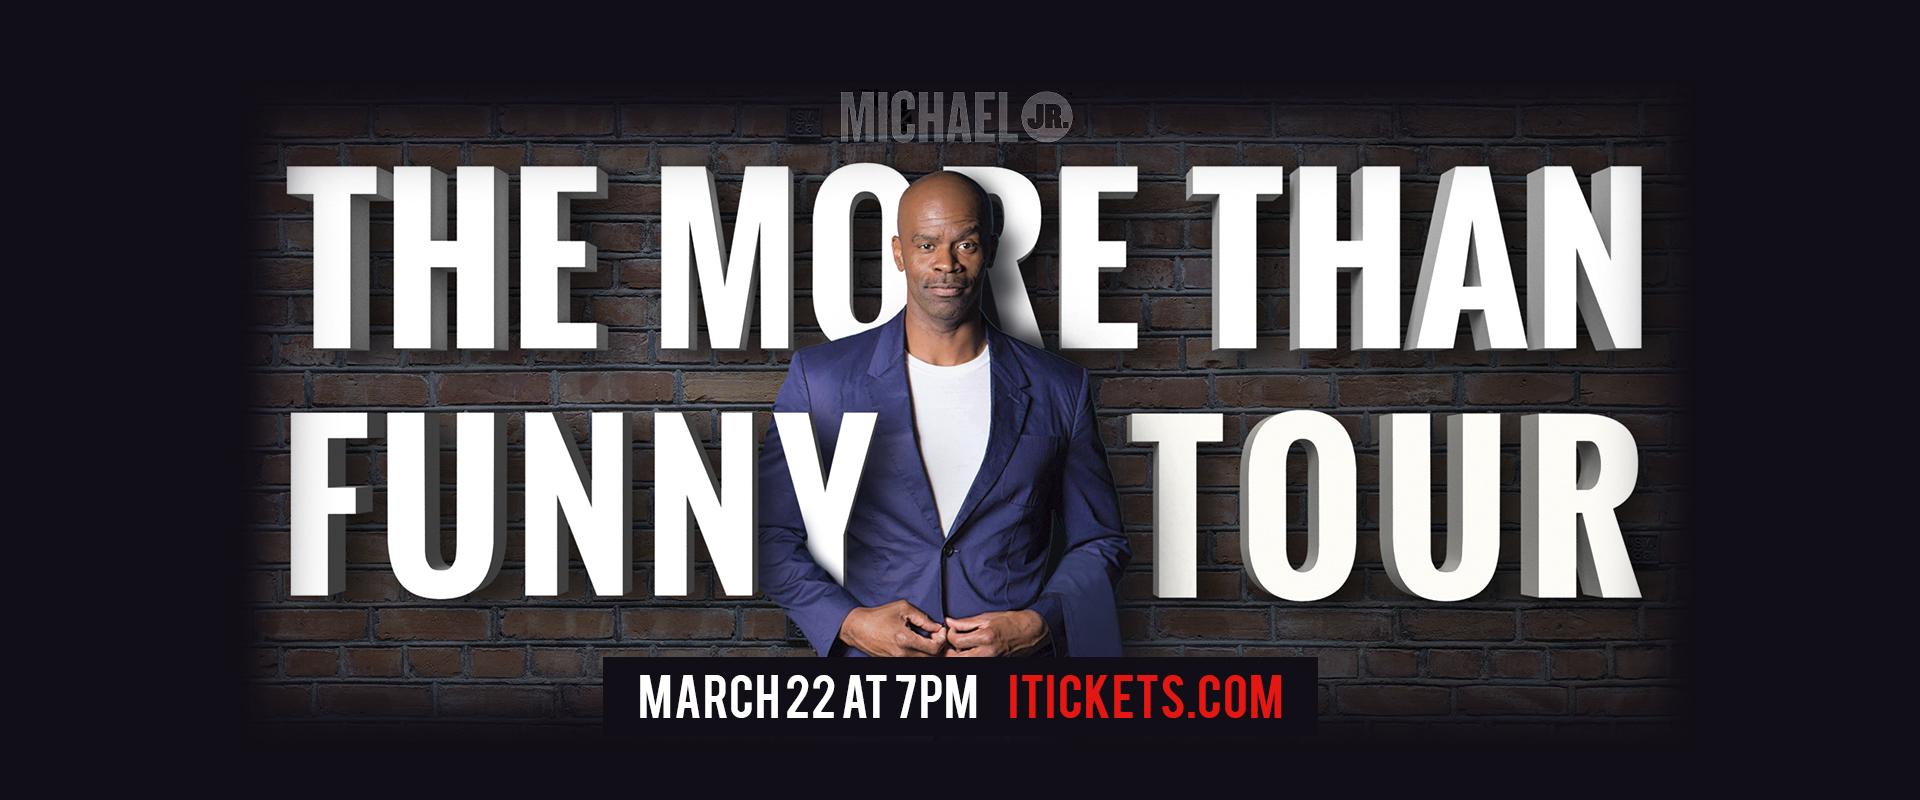 Michael Jr. - The More Than Funny Tour slide